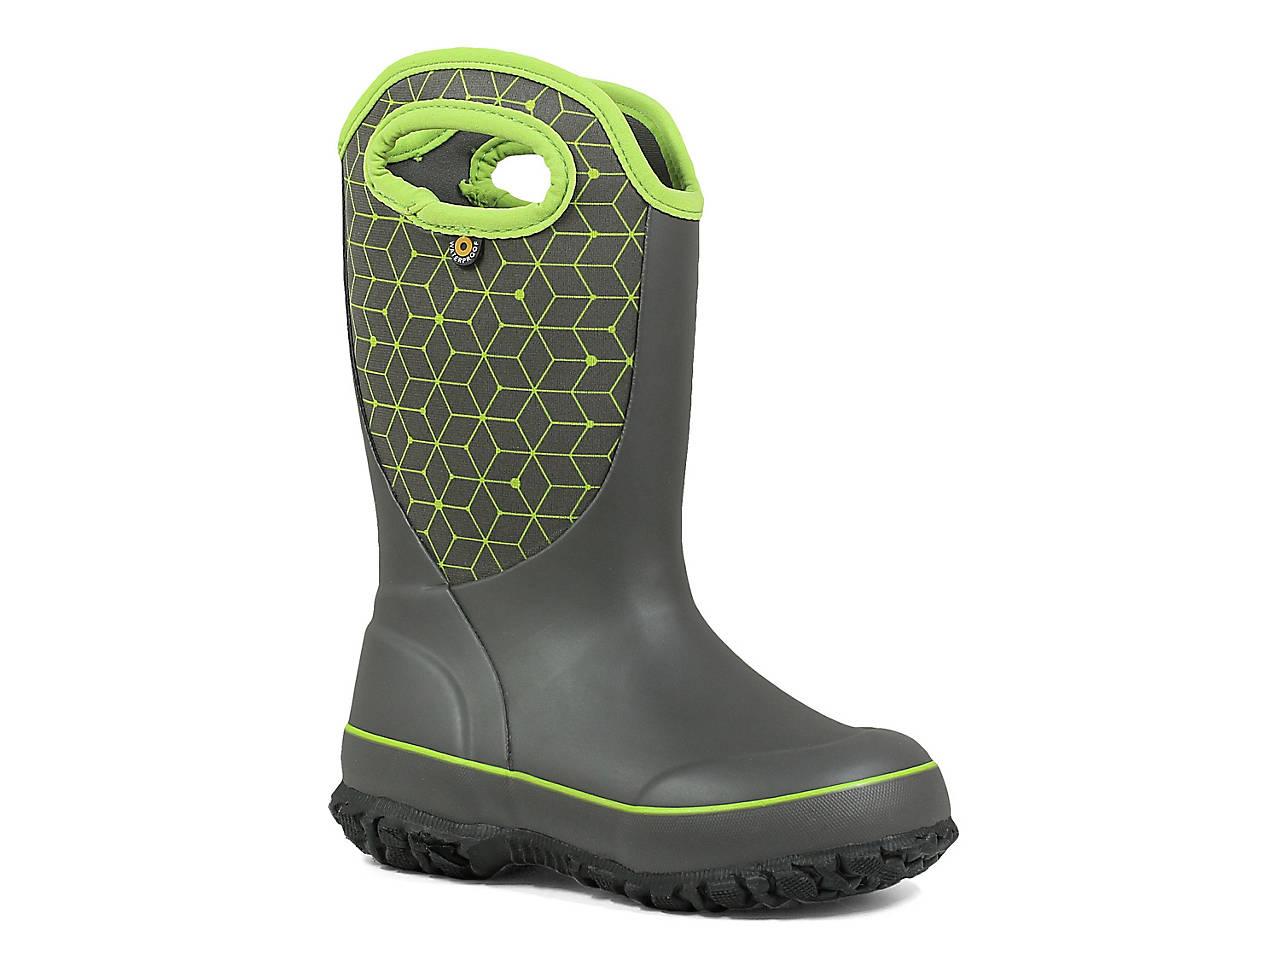 6497b53b1b0d Bogs Slushie Toddler   Youth Snow Boot Kids Shoes